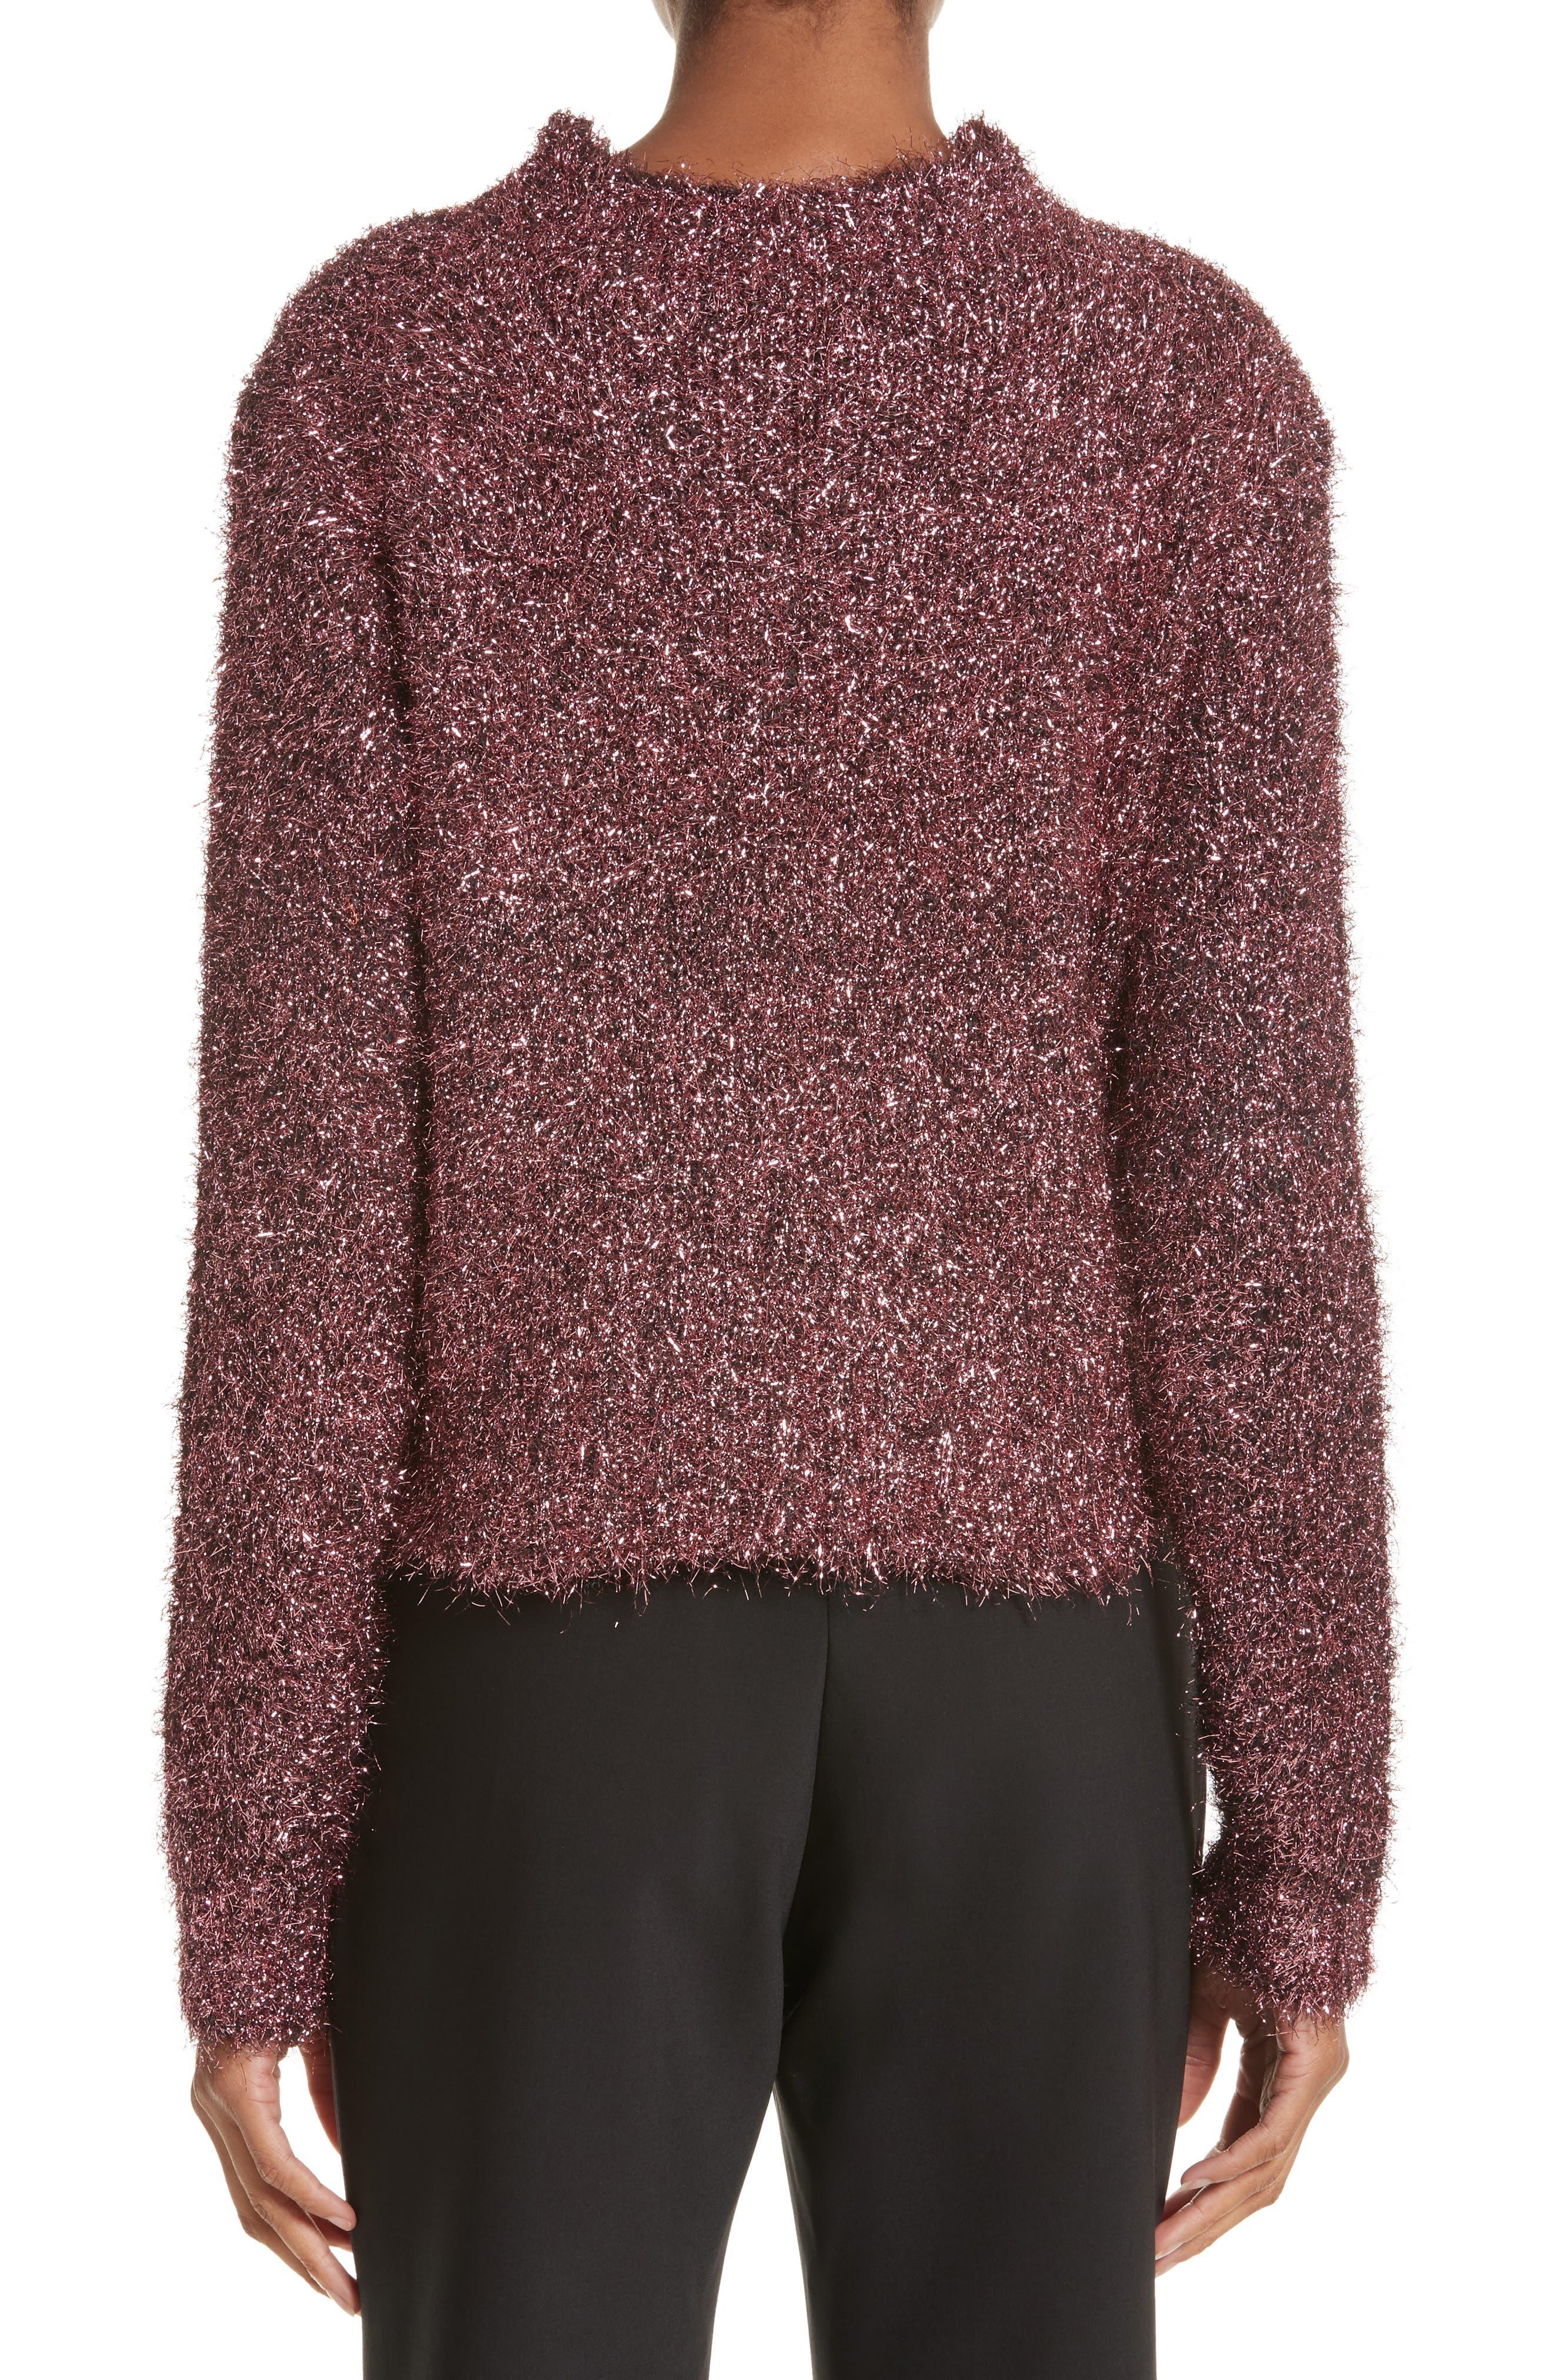 Vaporize Textured Metallic Sweater,                             Alternate thumbnail 2, color,                             Pink